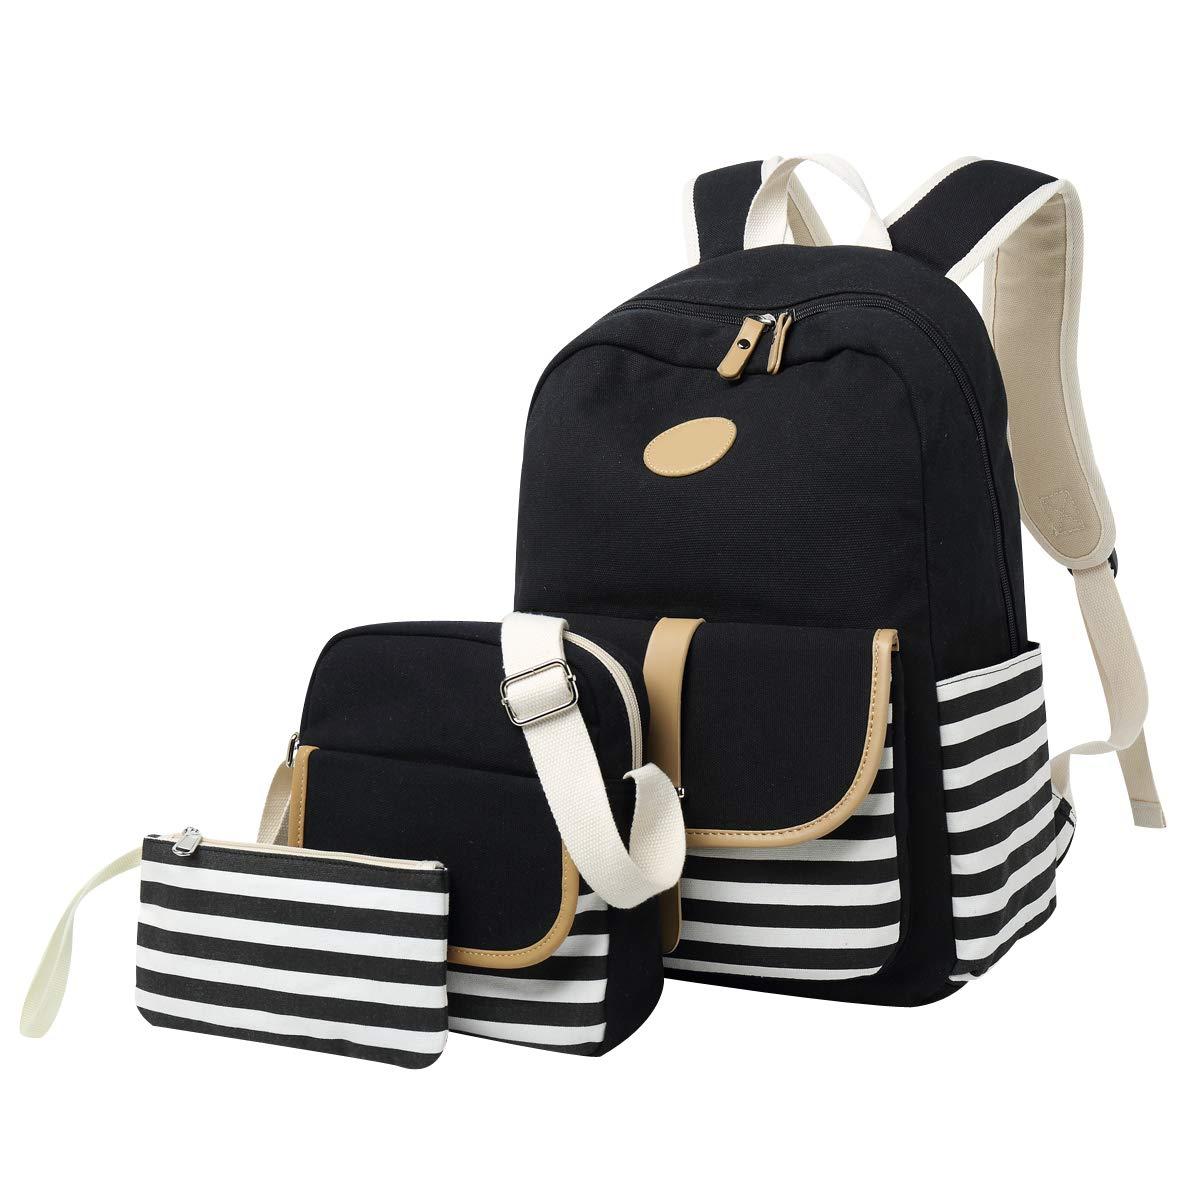 Mujeres Unicornio Escuela Informal Mochila Escolar Para Niñas Adolescentes Bolsa de ordenador portátil